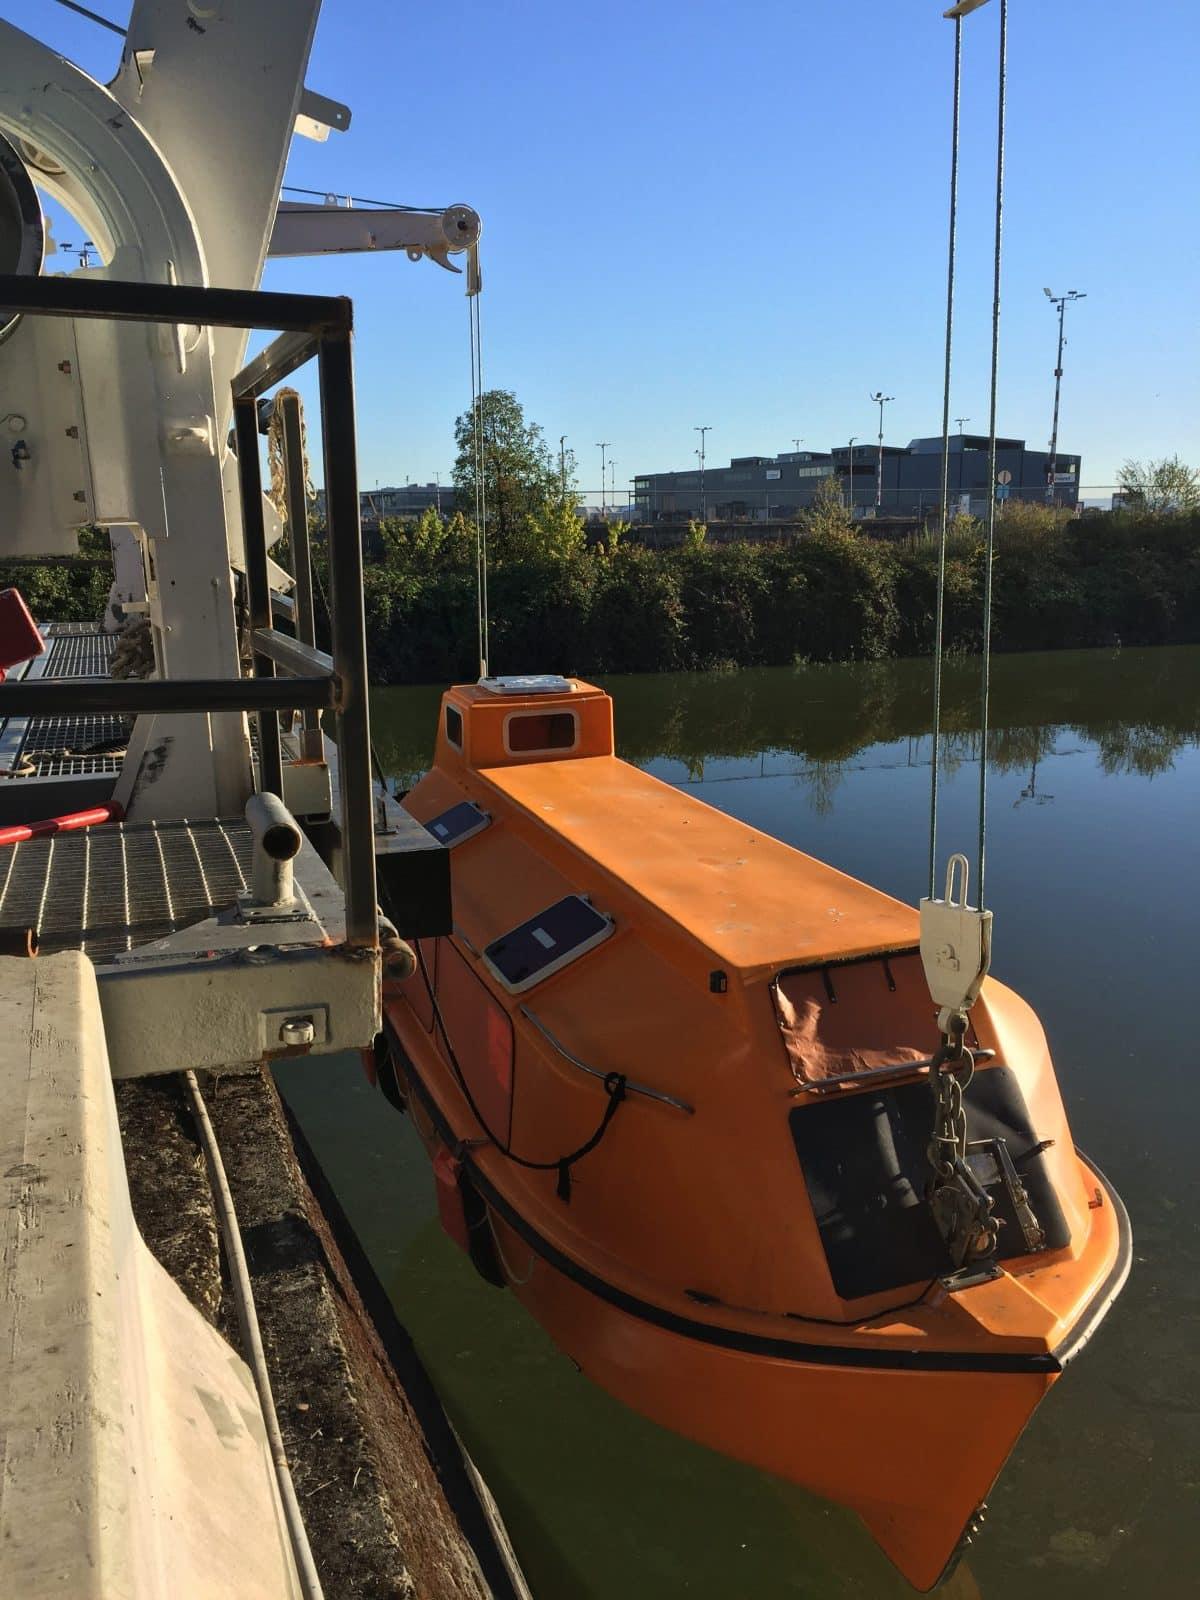 psc pscrb lifeboatman course Seattle Edmonds Washington